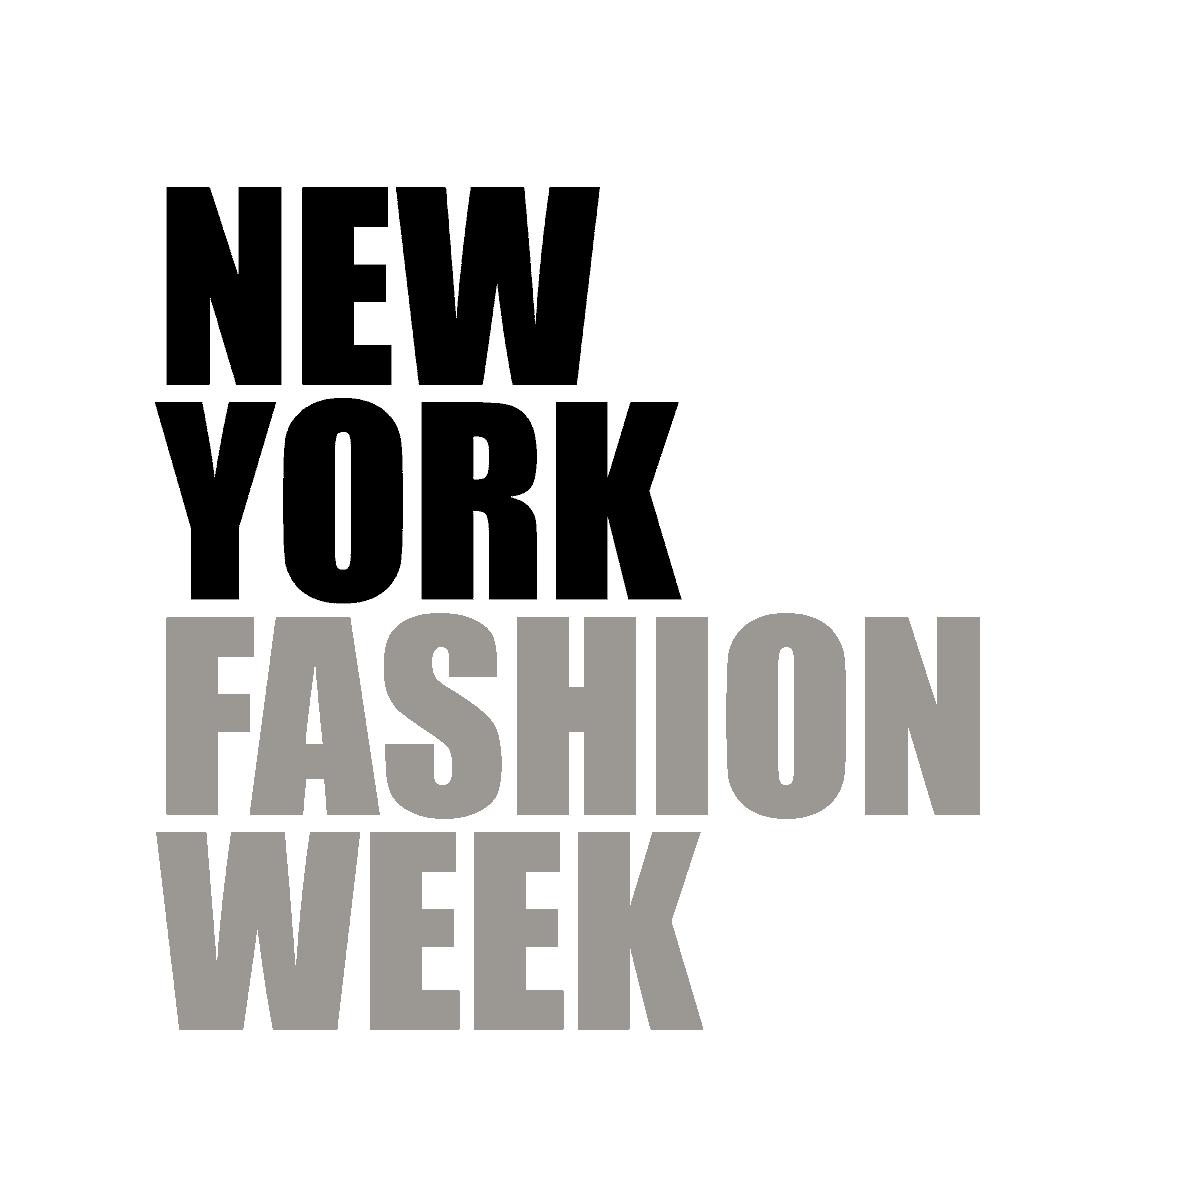 New York Fashion Week Fall Winter 2020 #360rawmagazine #Thebestfashionshow #internationalpress ON OUR RADAR Are you Ready?#DigitalContentplatform #fashion #frequencyofdailywebpublishing. #internacionalpress #photographer pic.twitter.com/oFV0iEAUs0